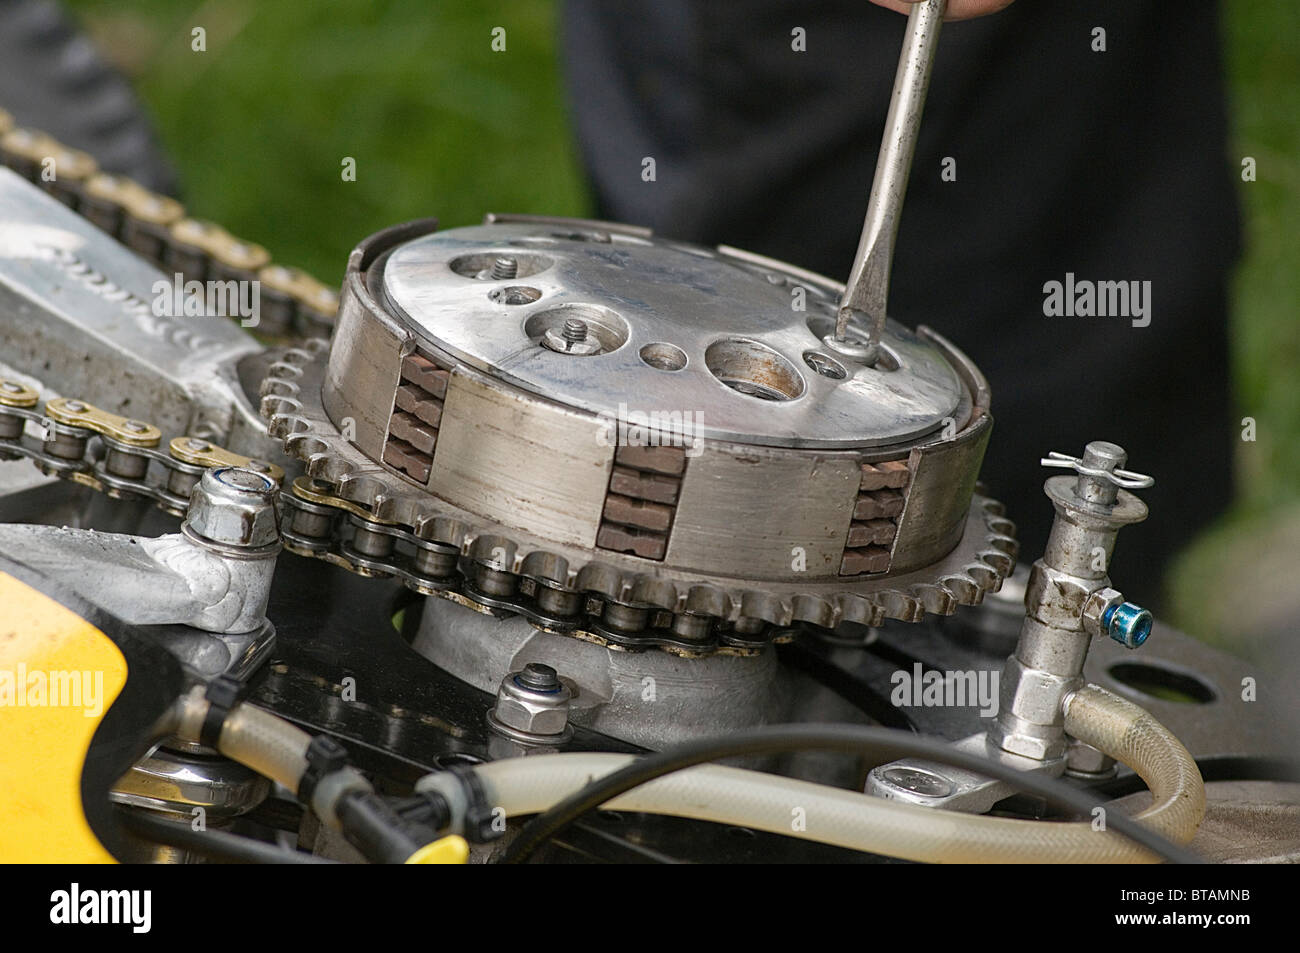 motorcycle-clutch-clutches-basket-plates-friction-plate-flywheel-pressure-BTAMNB.jpg